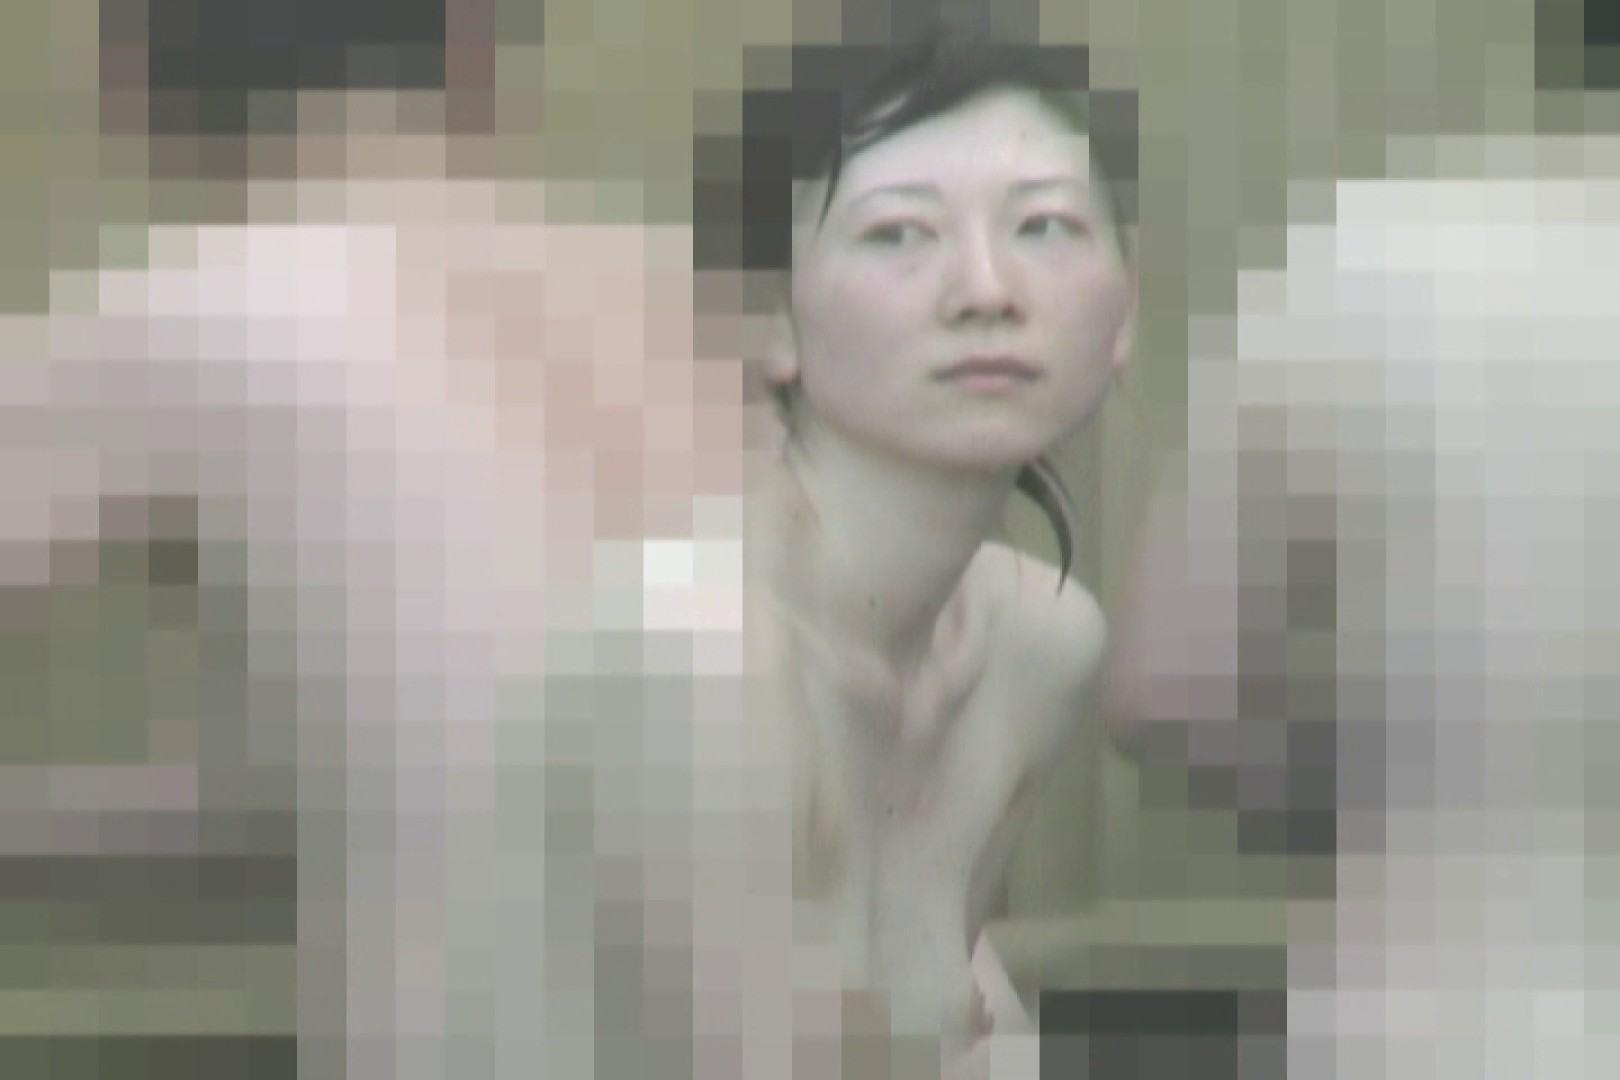 Aquaな露天風呂Vol.835 露天風呂 スケベ動画紹介 65連発 59